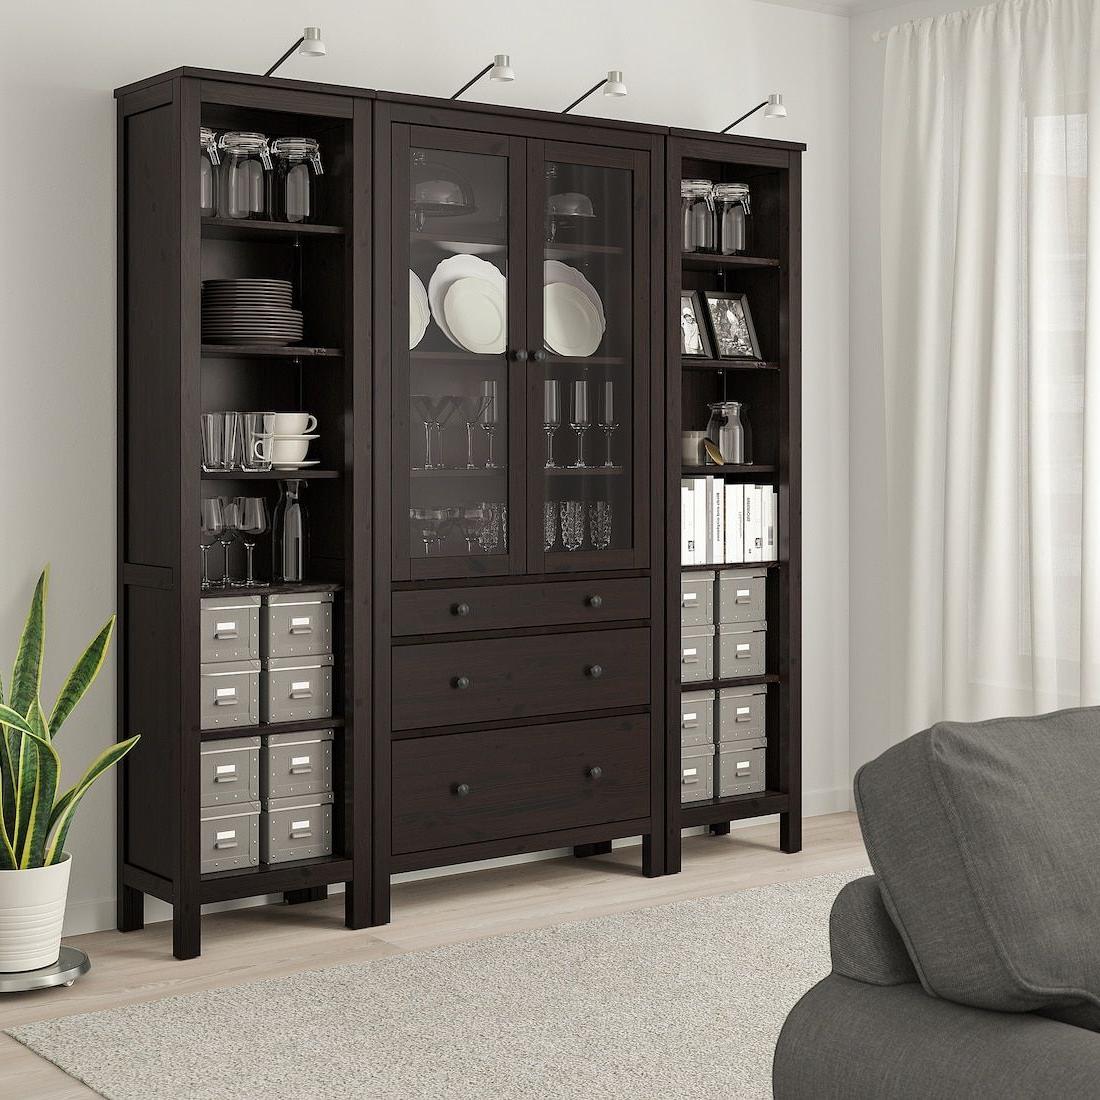 Hemnes Storage Combination W Doors/drawers – Black Brown Regarding Dark Brown Tv Cabinets With 2 Sliding Doors And Drawer (View 13 of 20)